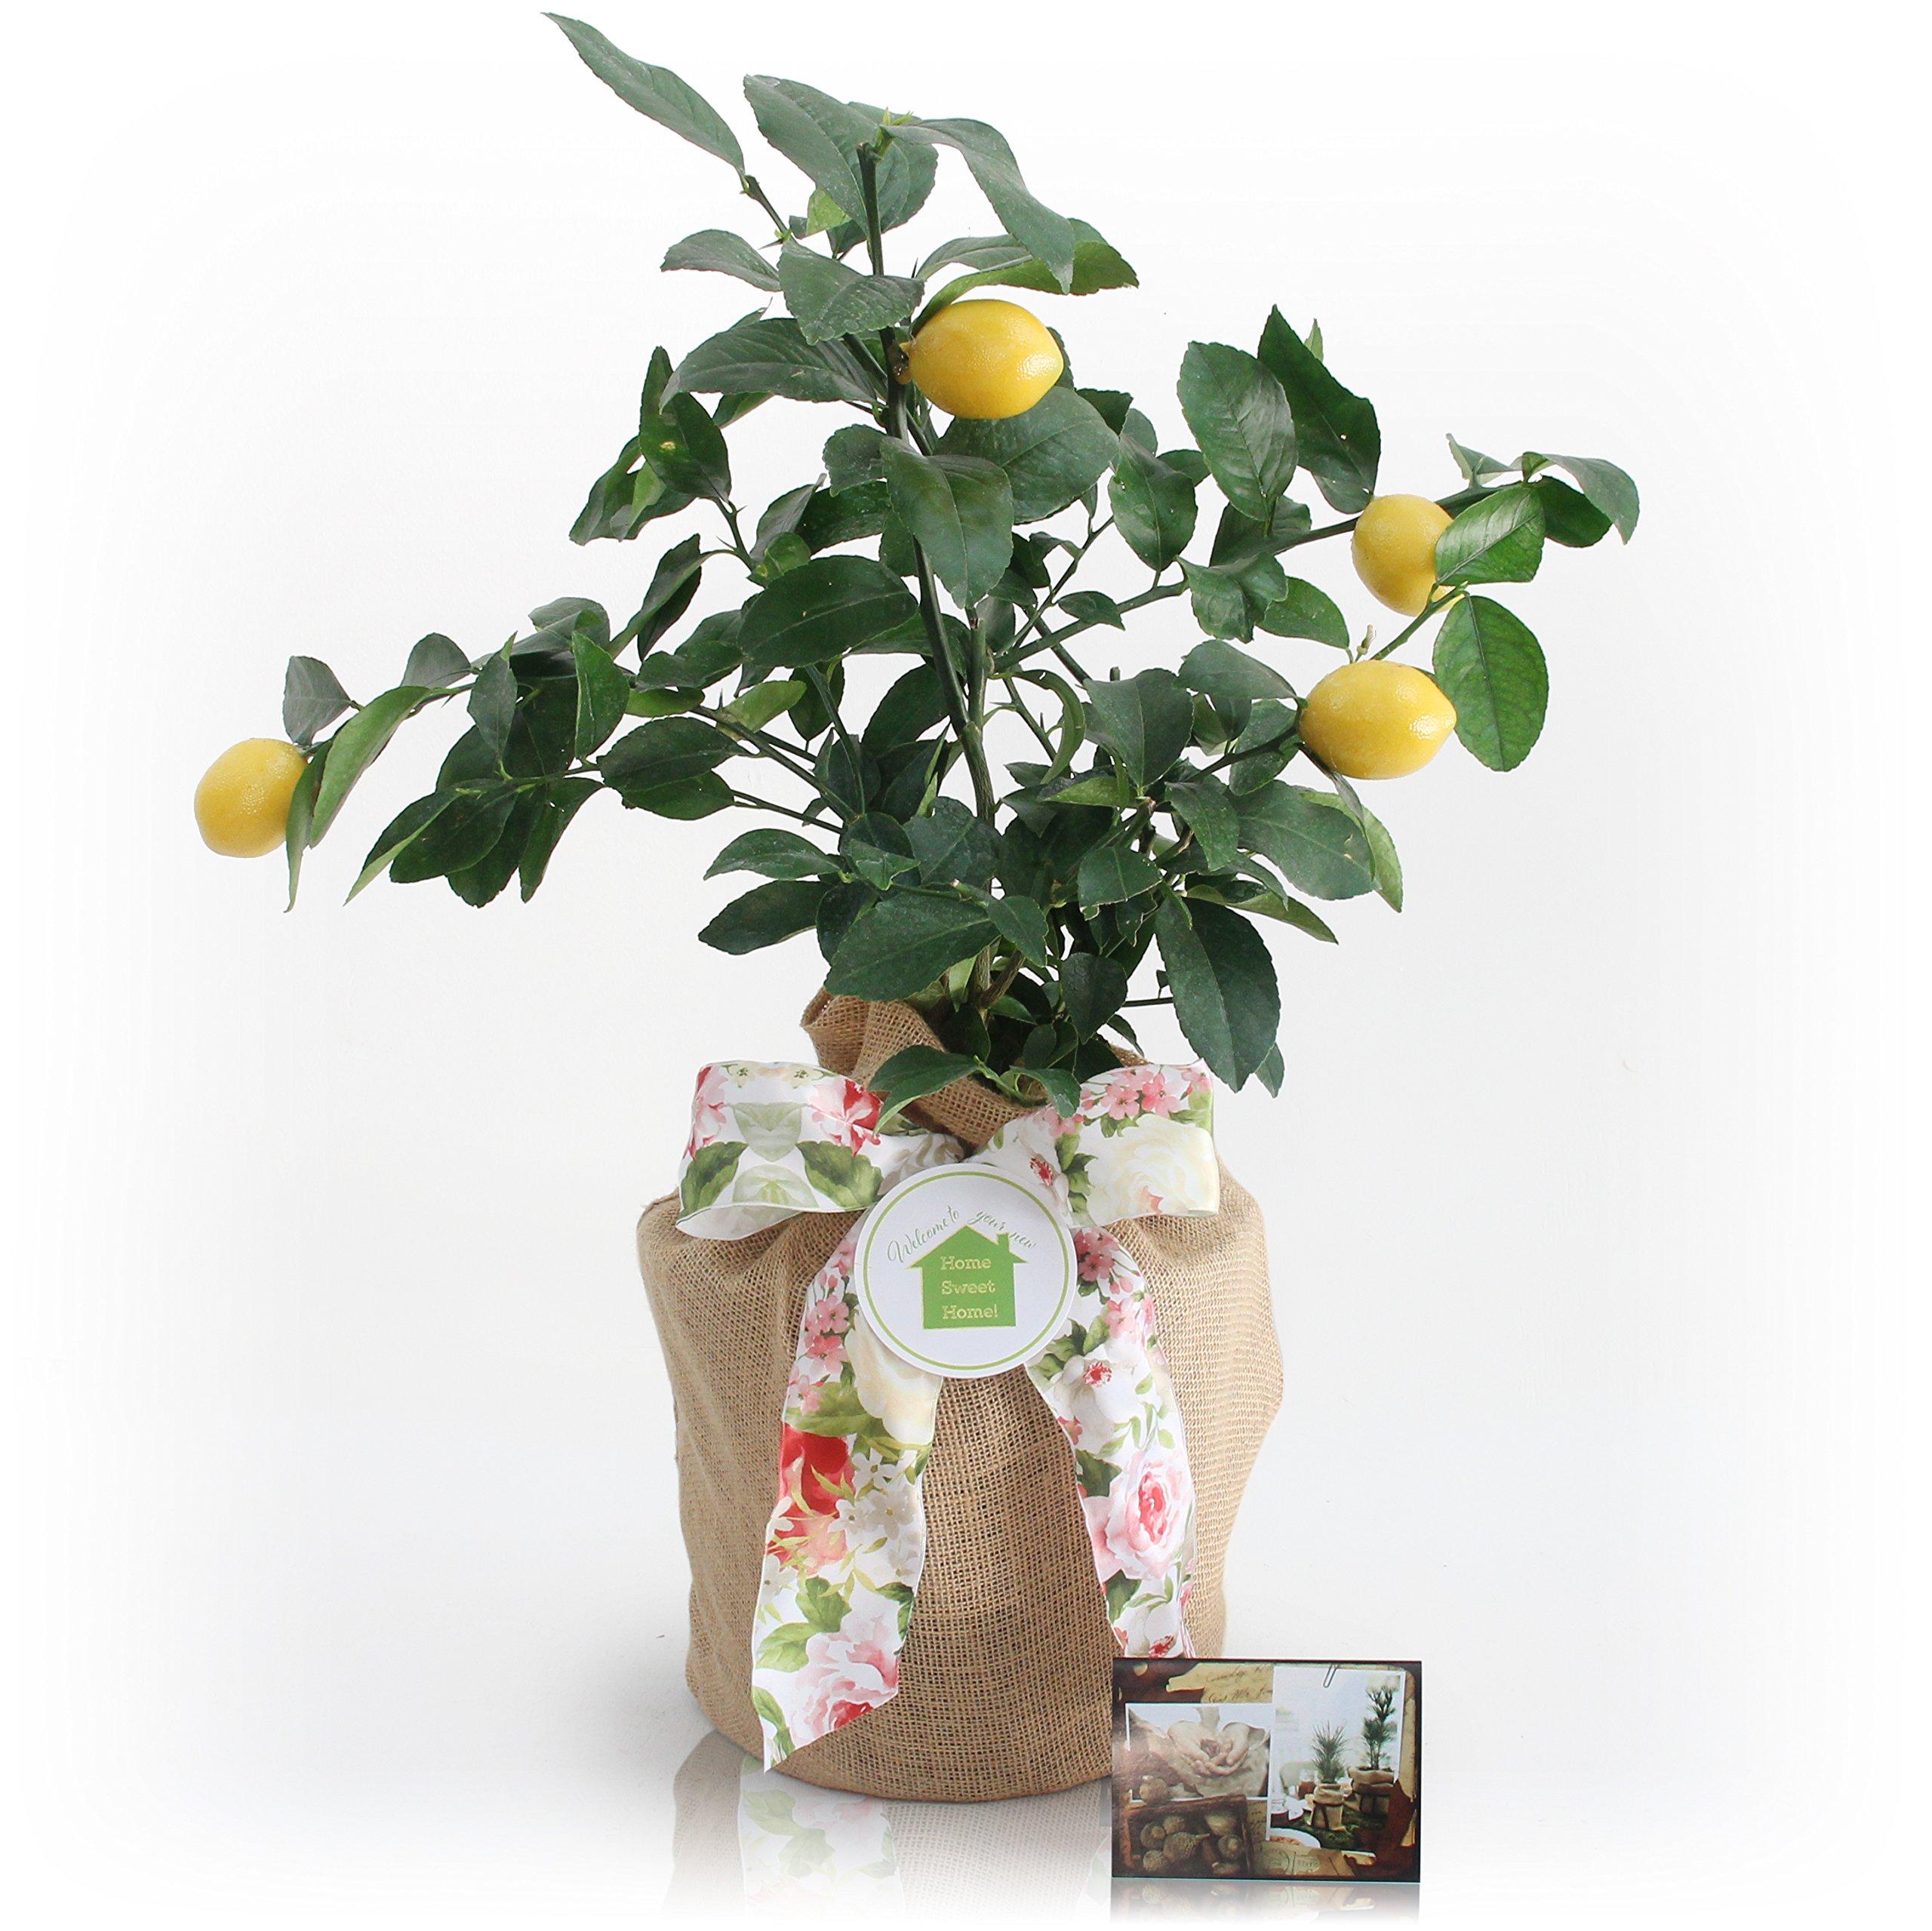 Housewarming Meyer Lemon Gift Tree by The Magnolia Company - Get Fruit 1st Year, Dwarf Fruit Tree with Juicy Sweet Lemons, NO Ship to TX, LA, AZ and CA by The Magnolia Company (Image #4)